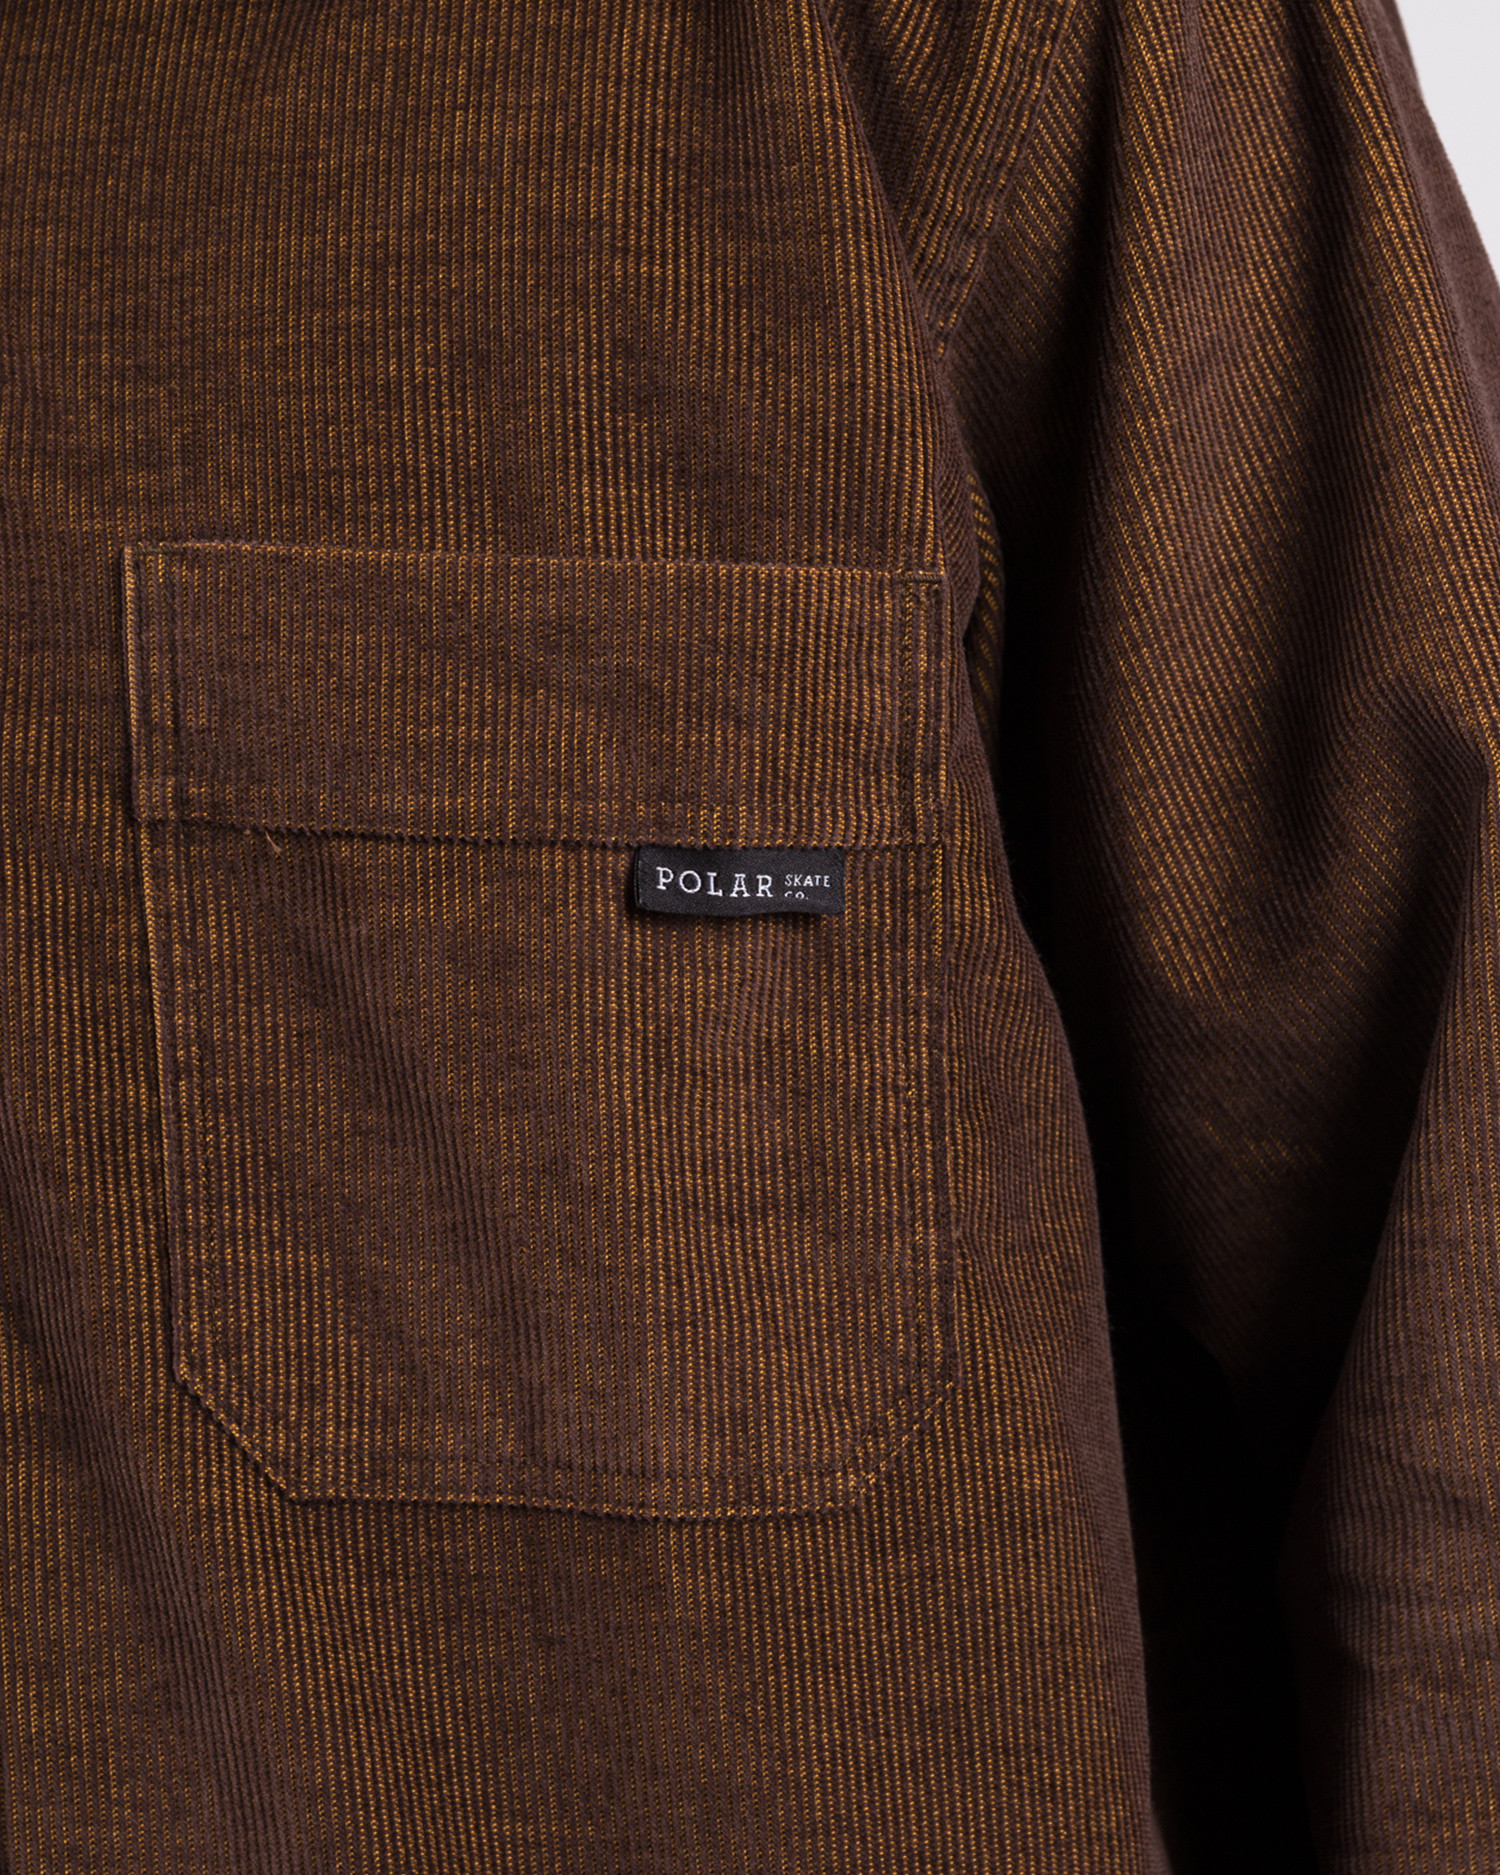 Polar Cord Shirt Caramel